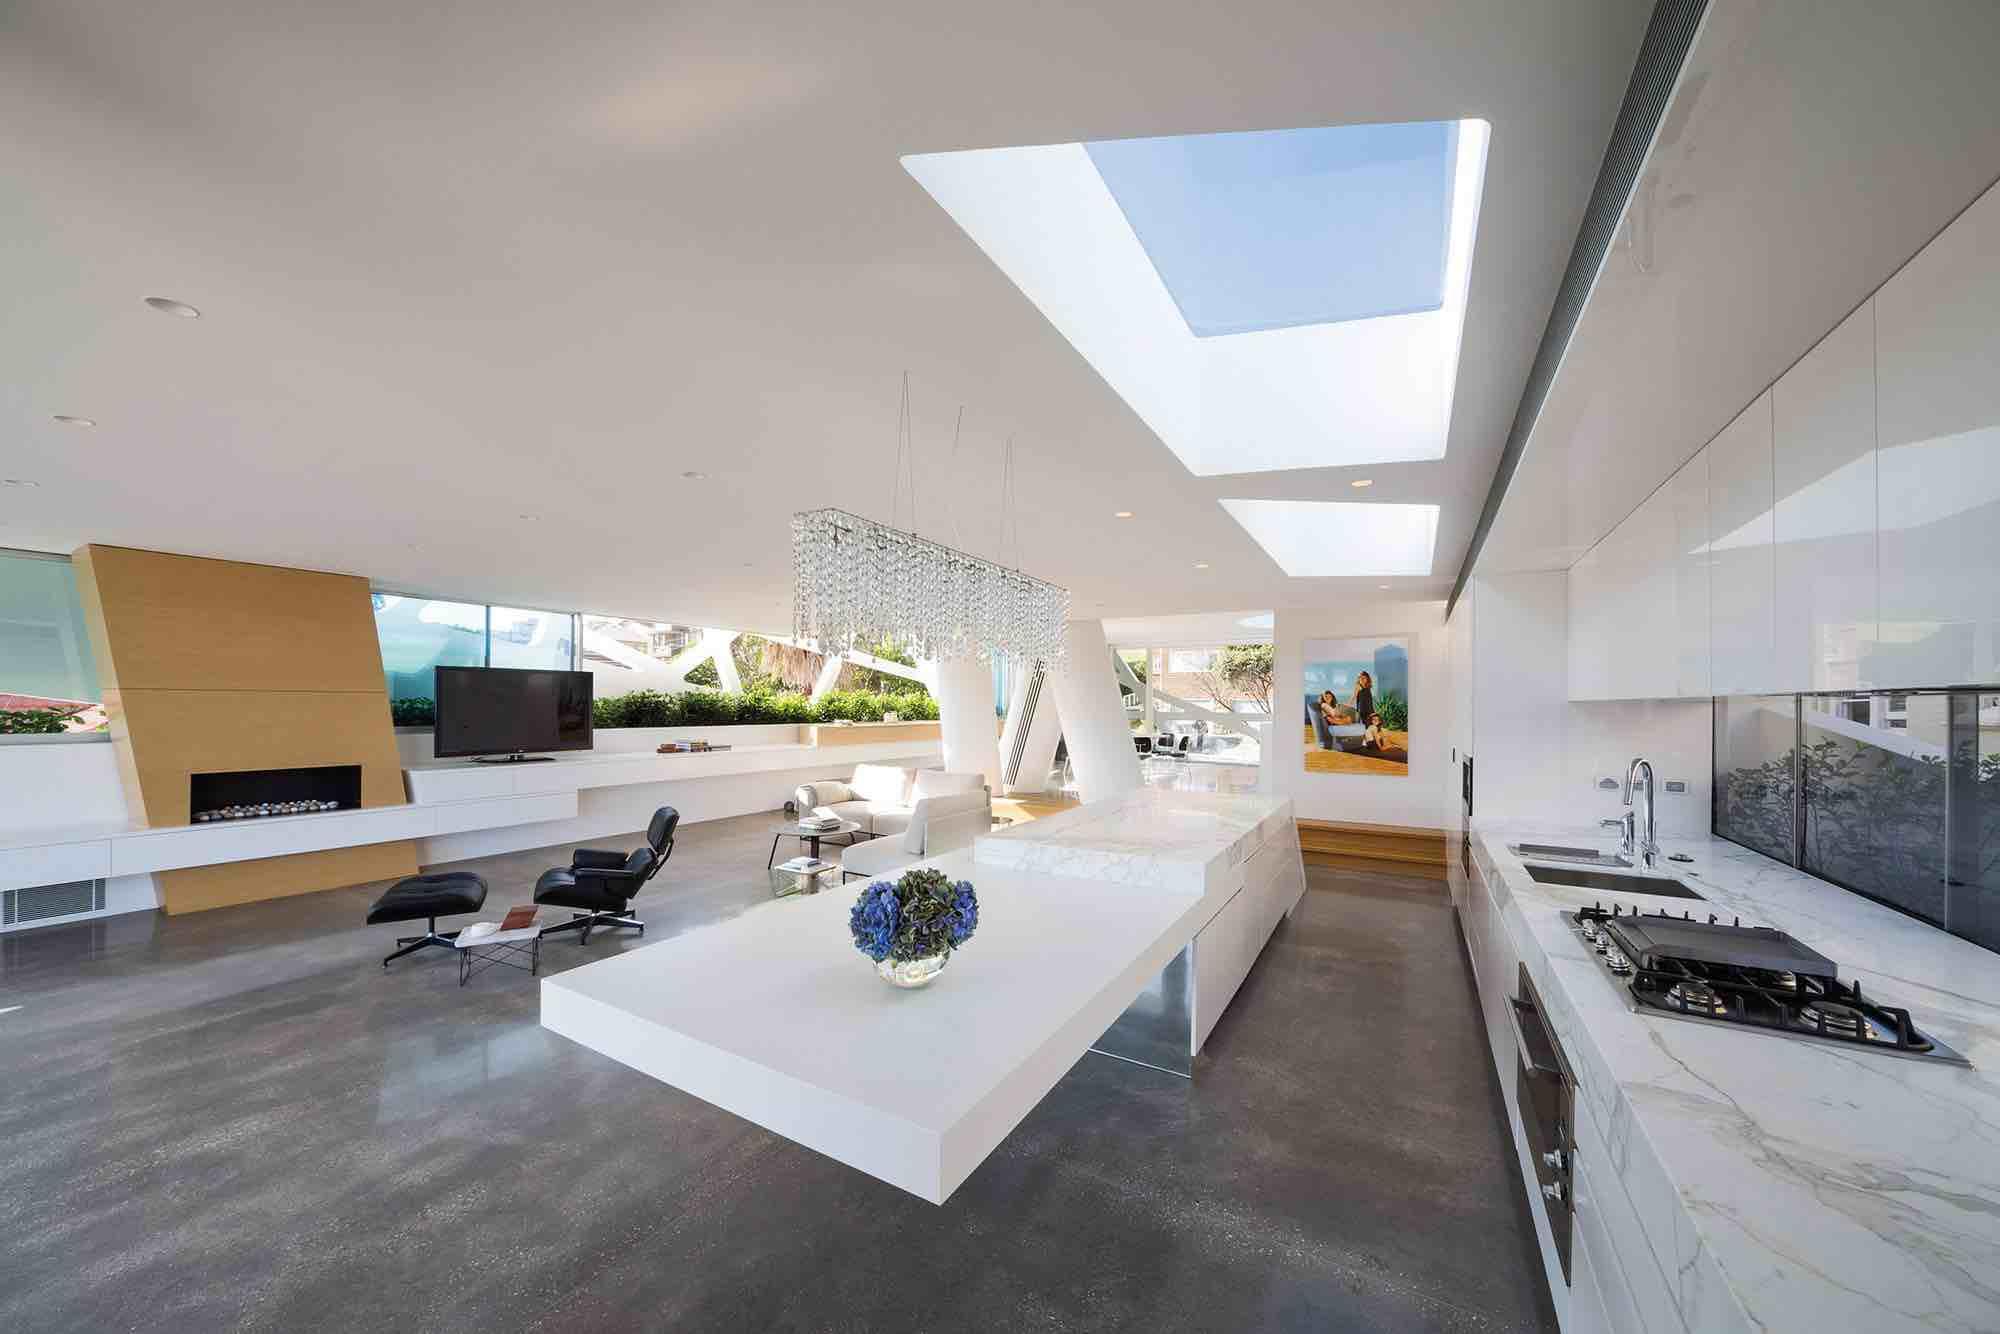 hewlett-street-house-mpr-design-group_hewlett_house15